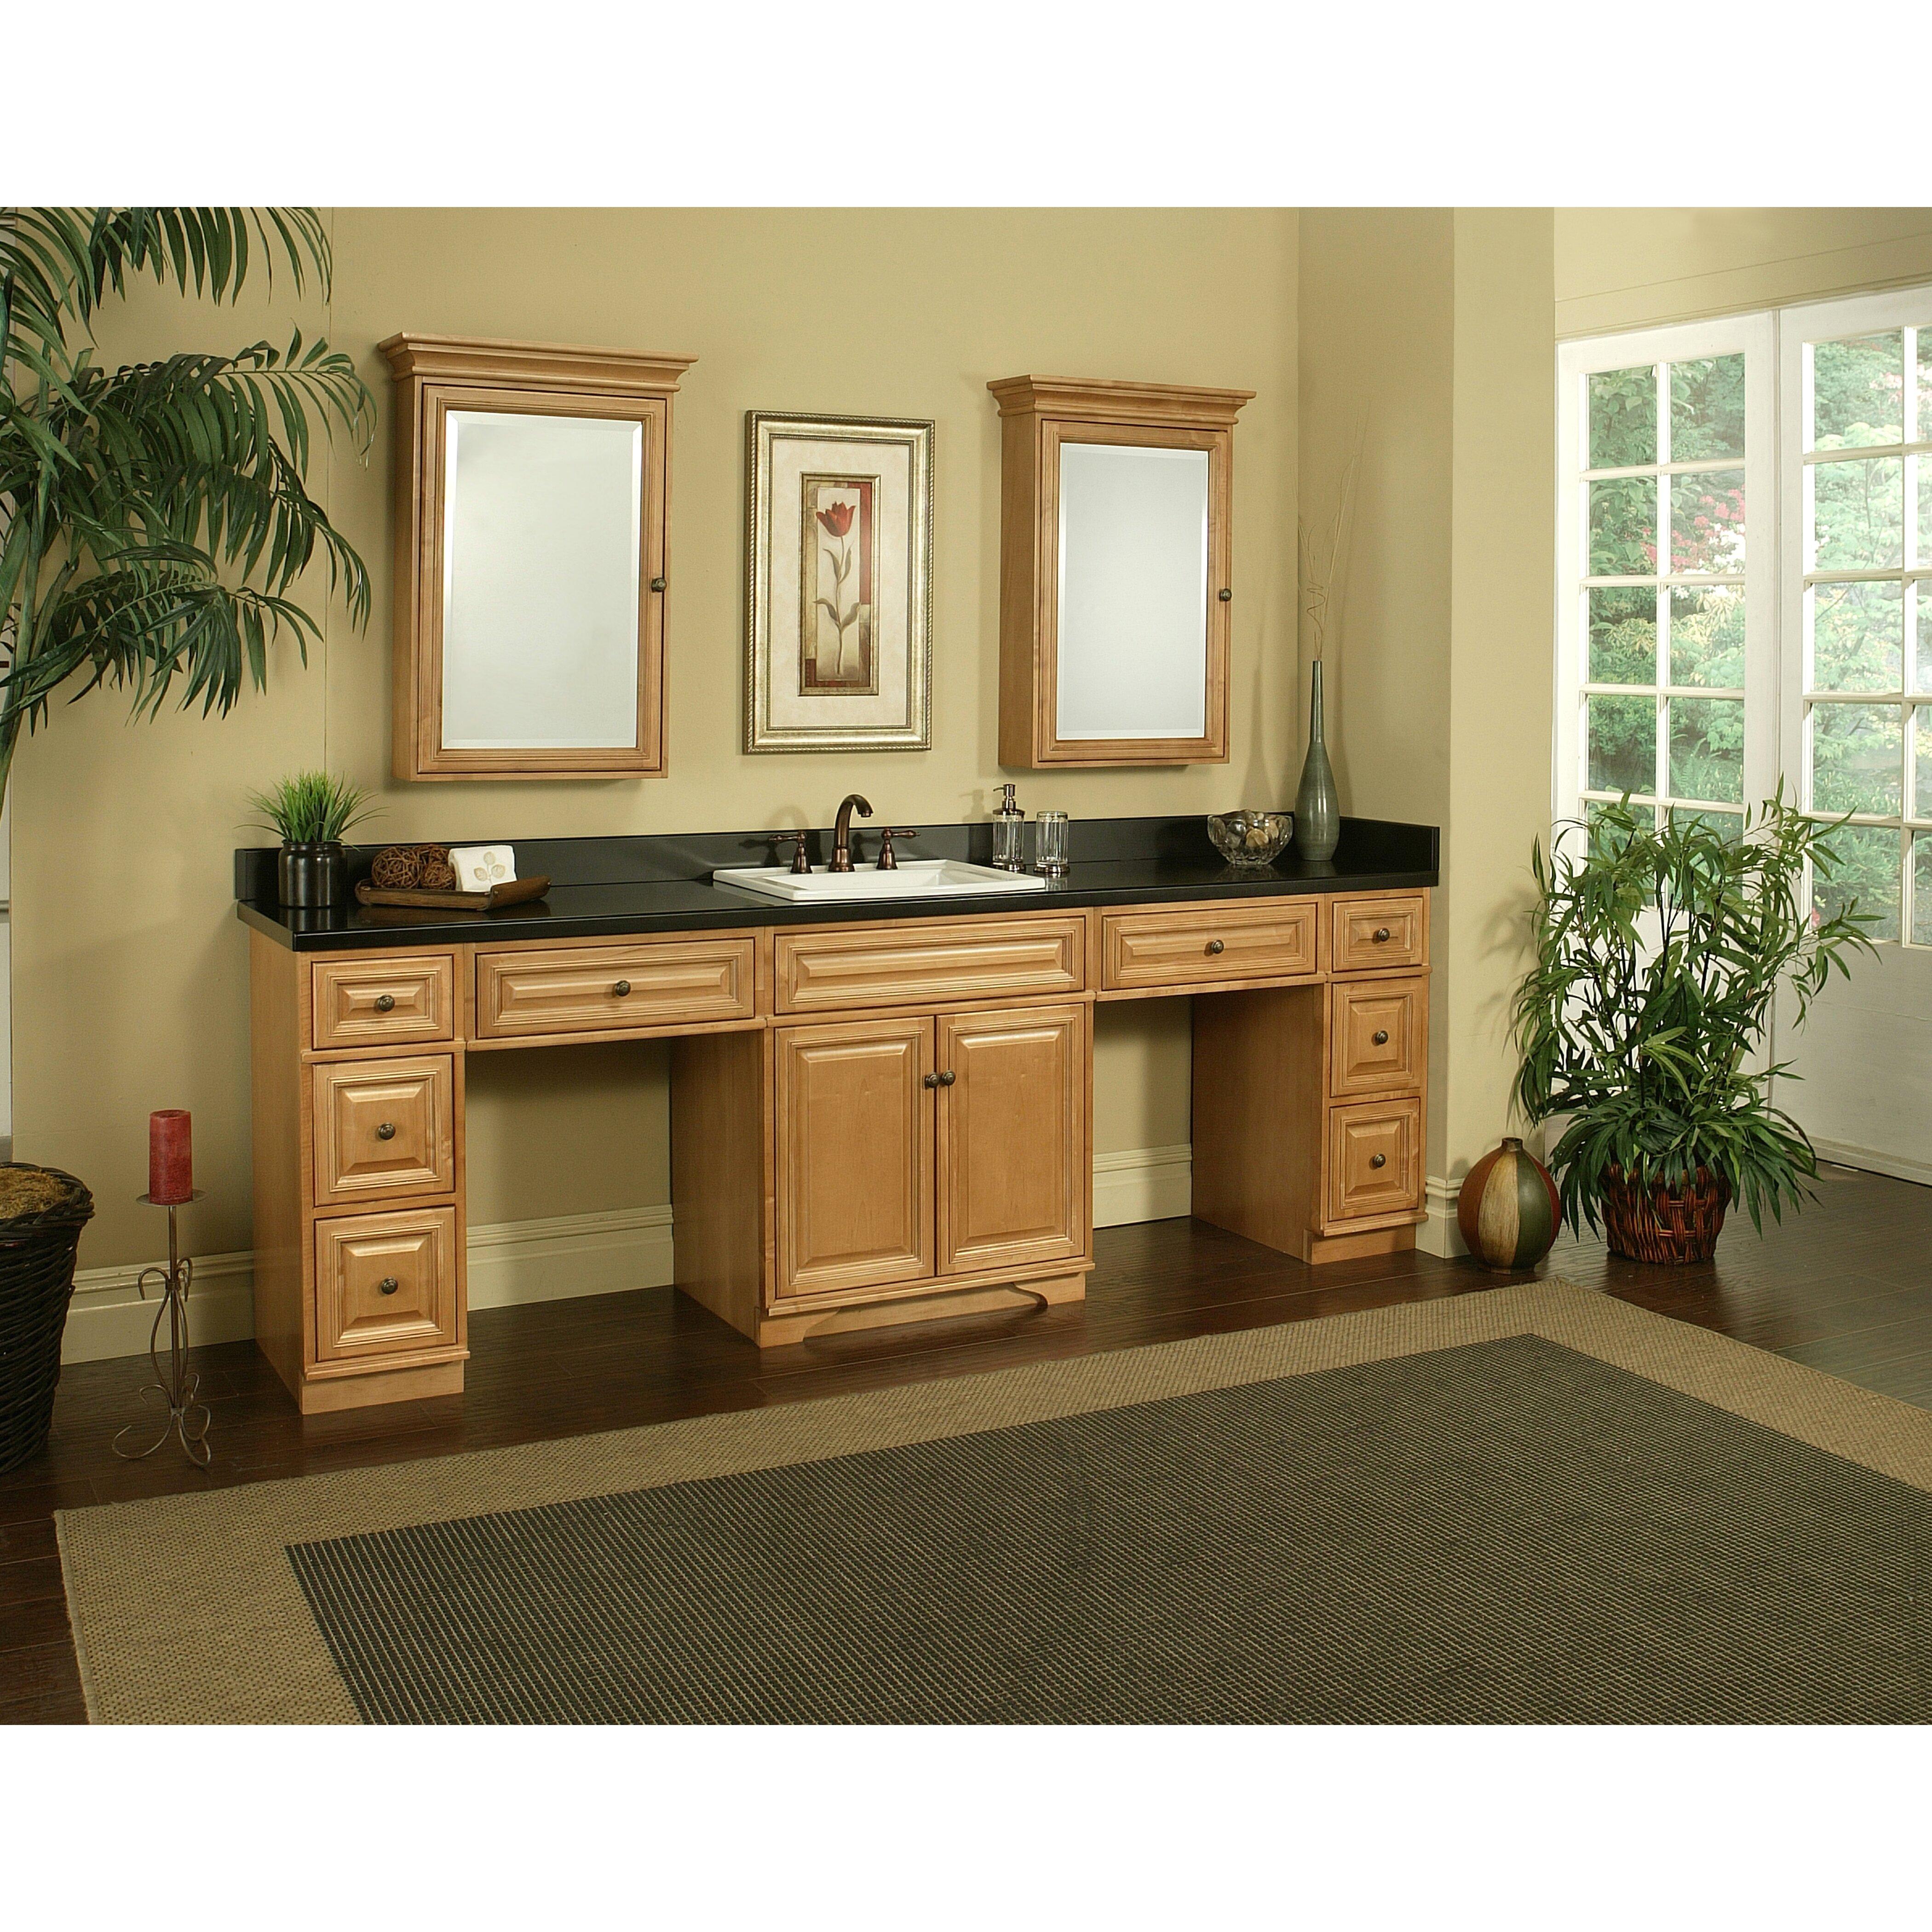 "Sunnywood Kitchen Cabinets: Sunny Wood Briarwood 24"" Modular Component Drawer"